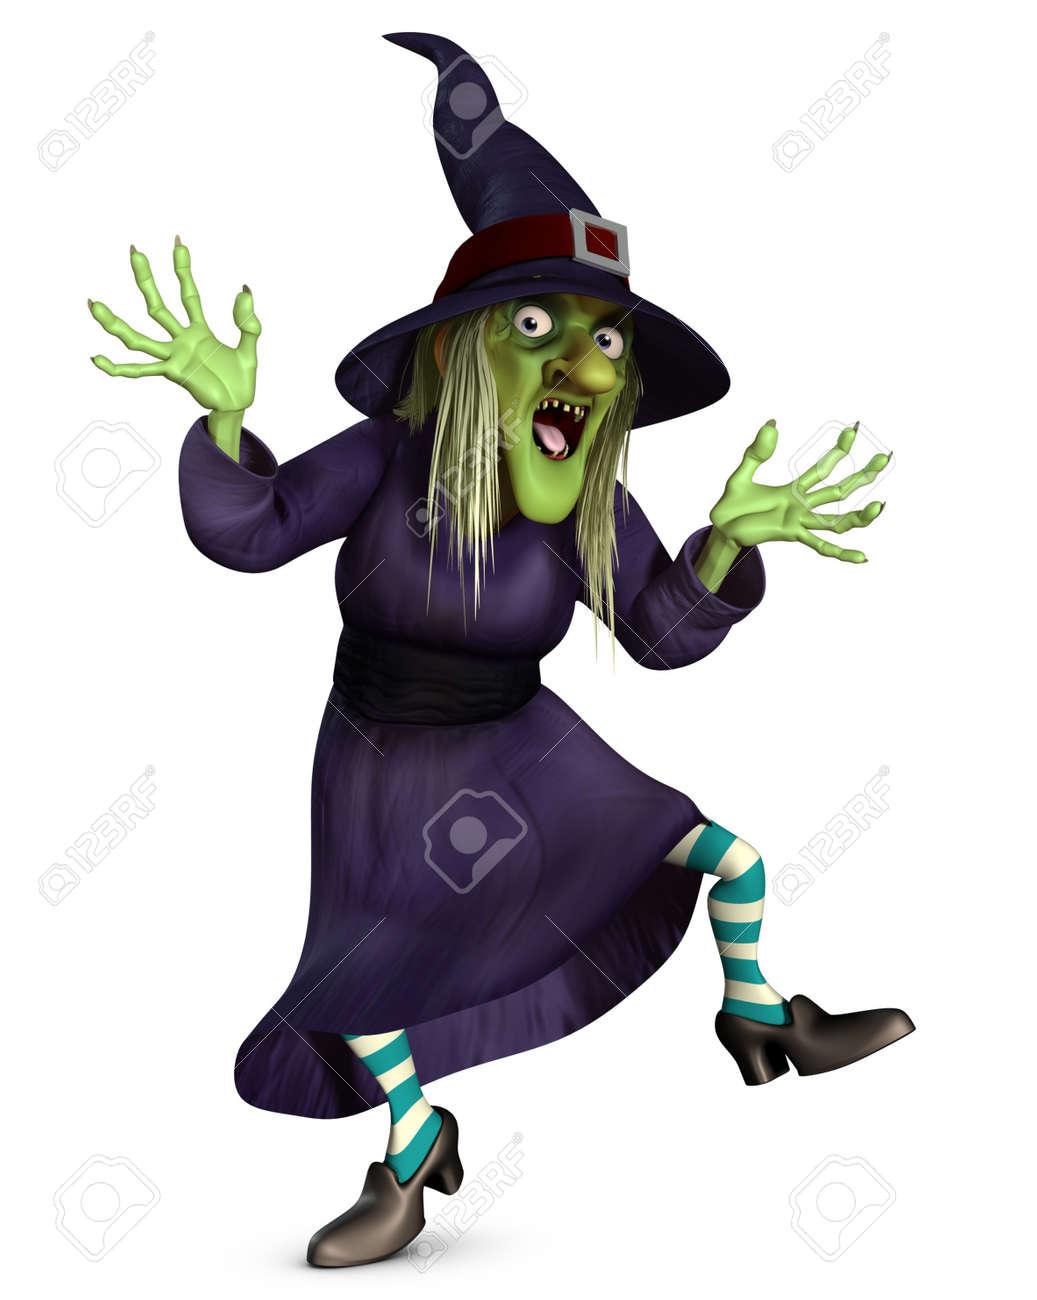 witch 3d cartoon halloween crazy witch - Halloween Witch Cartoon